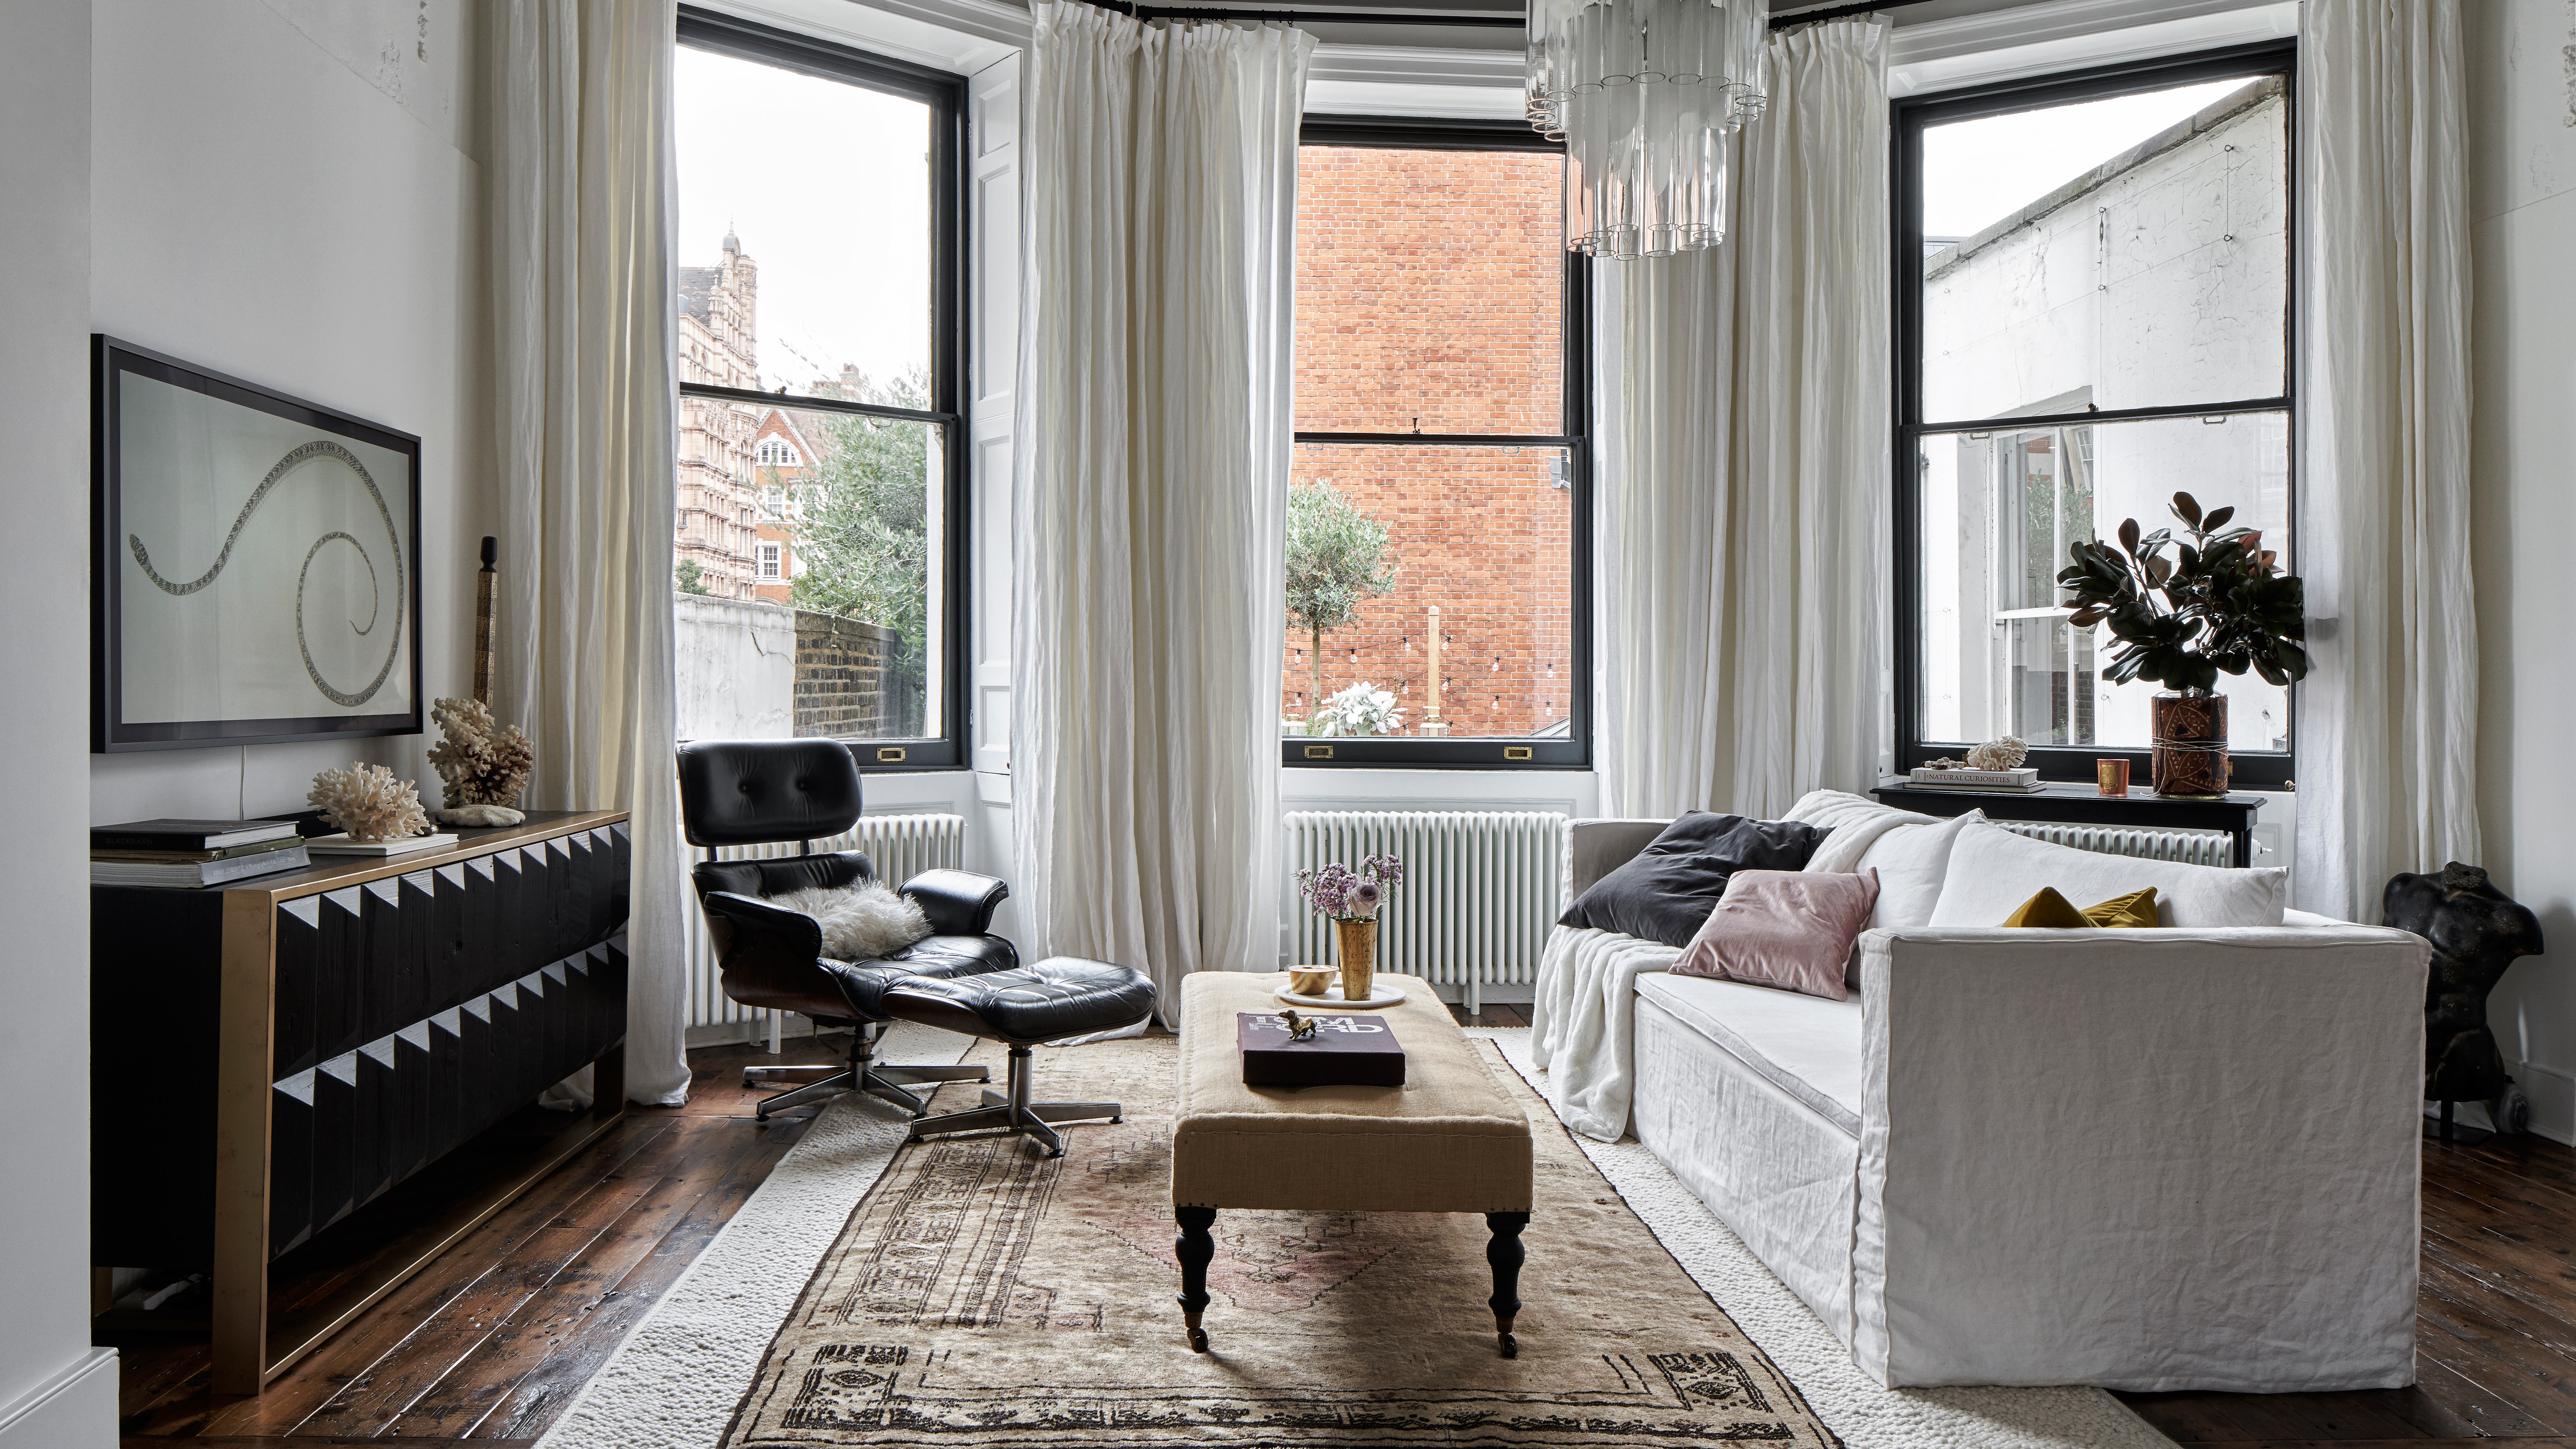 16 Small Apartment Living Room Ideas, Living Room Ideas Apartment